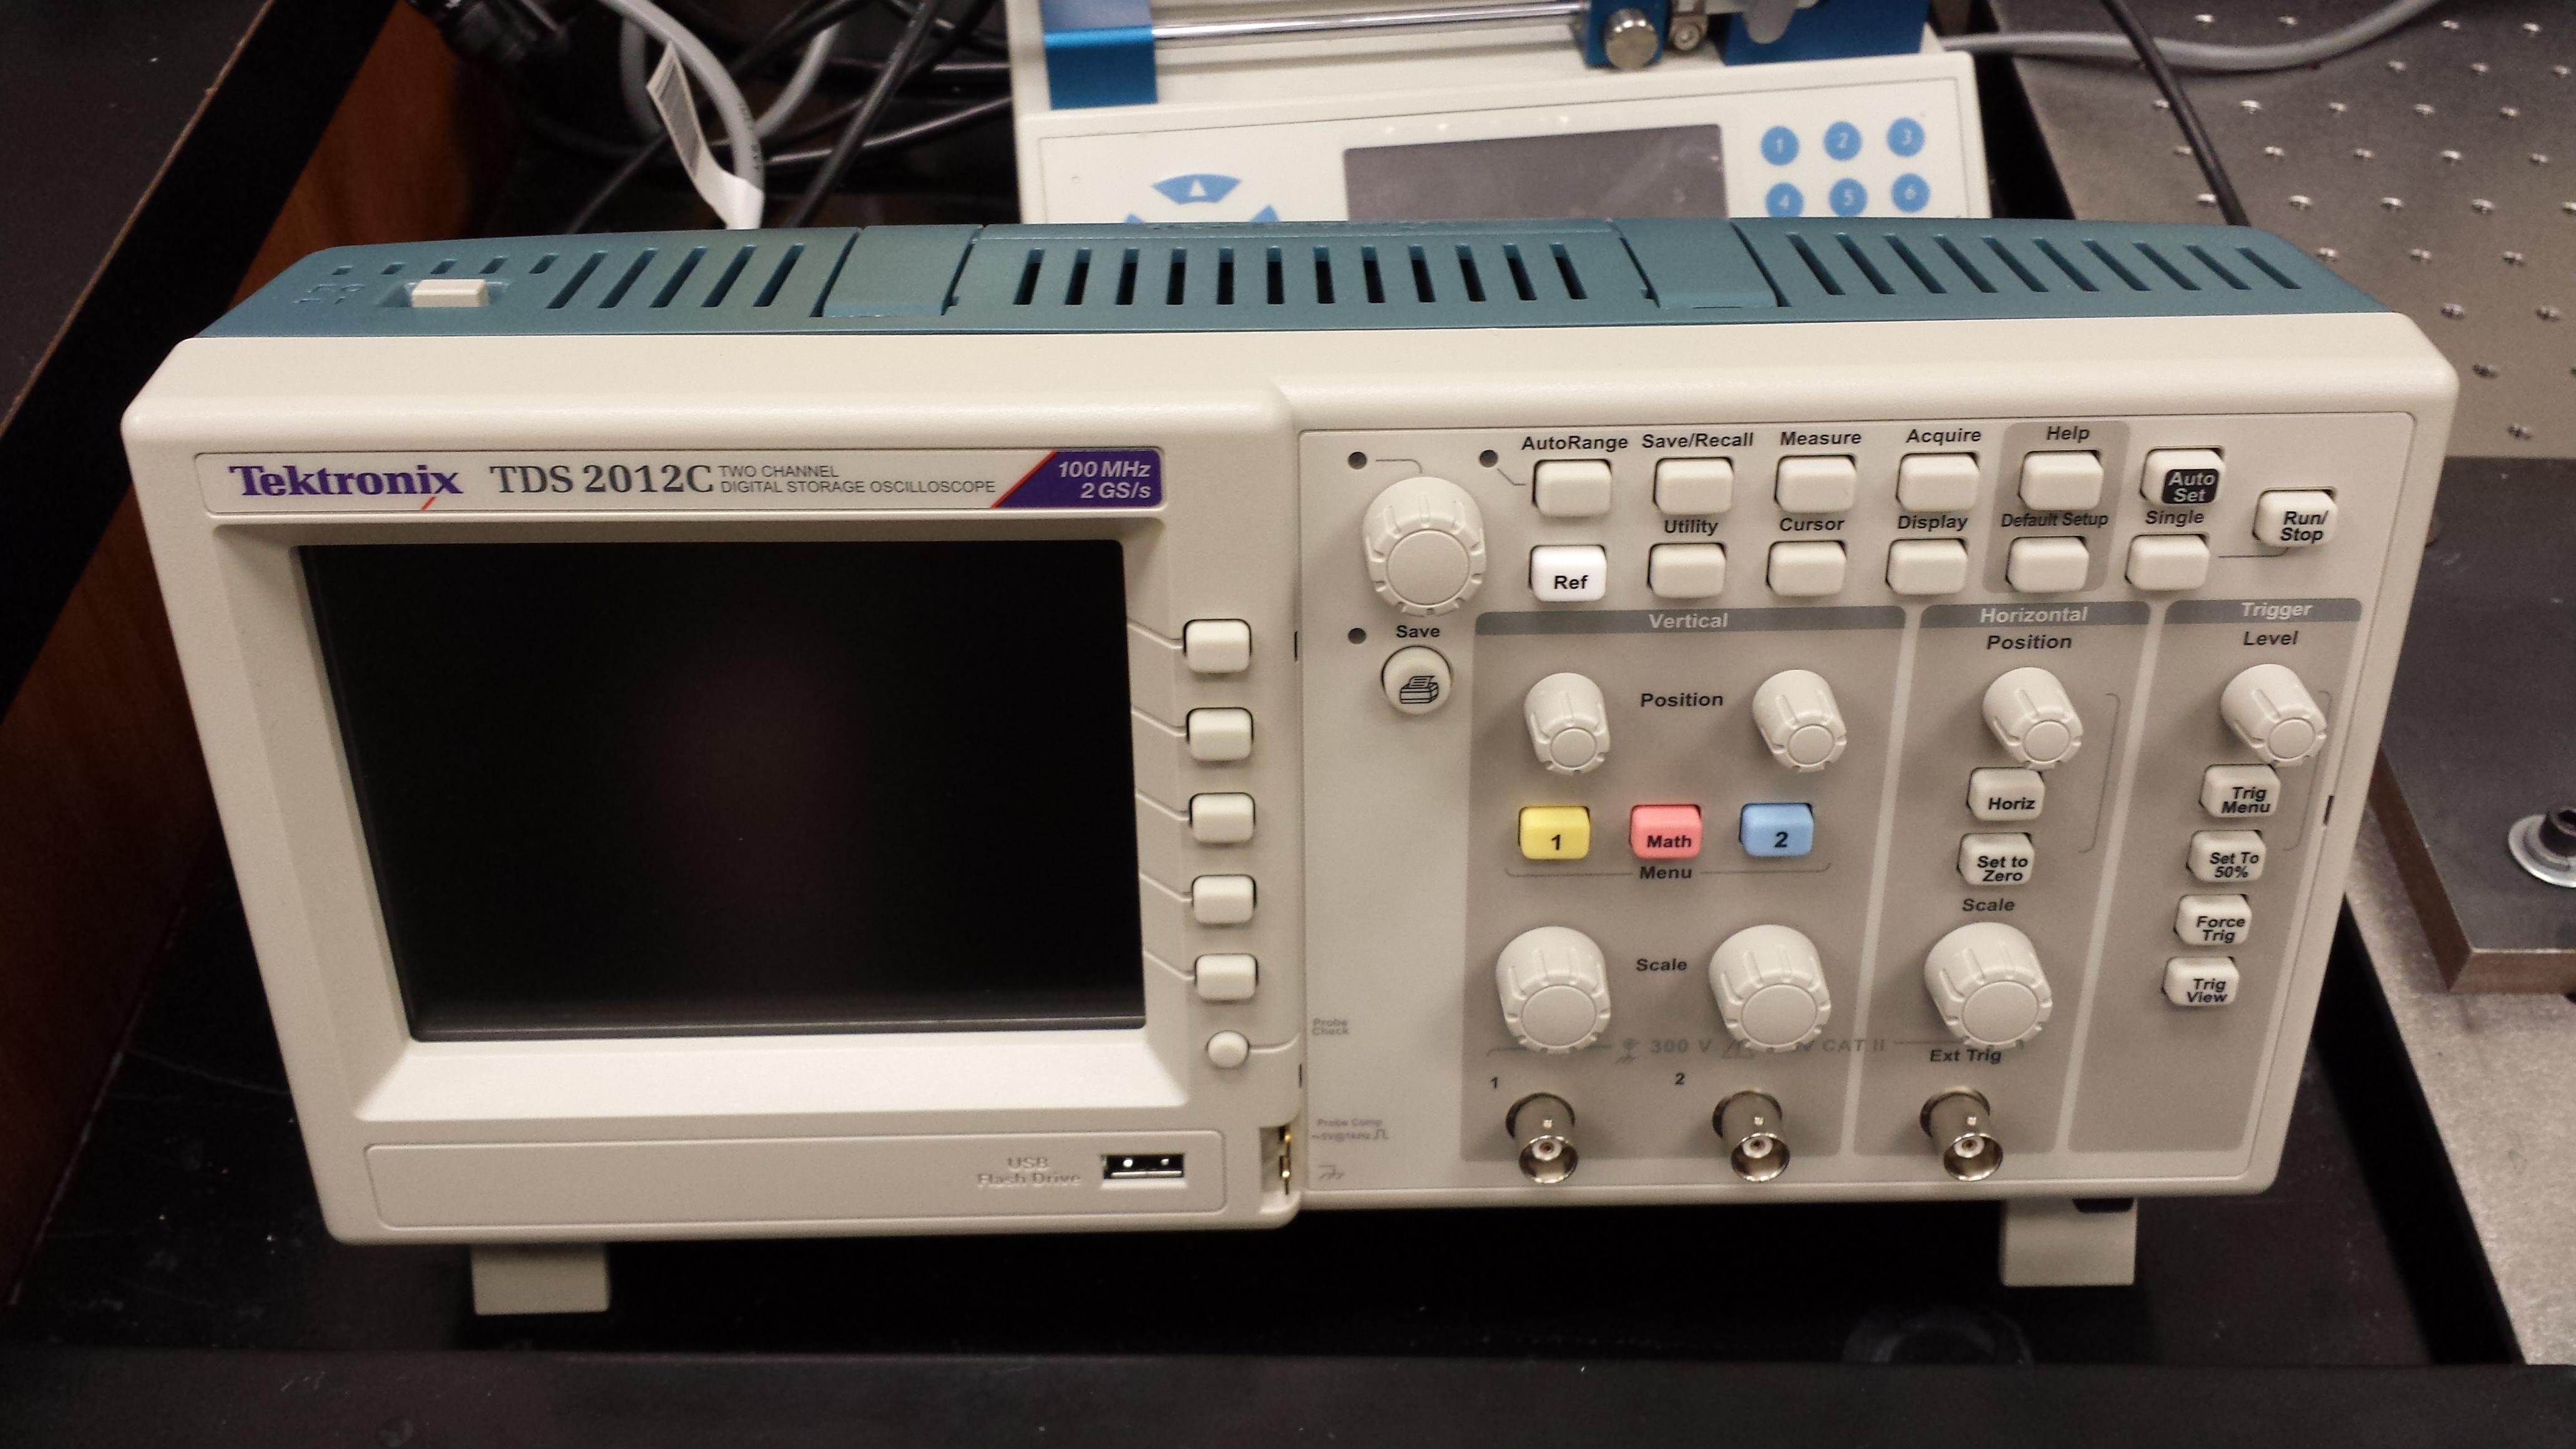 Oscilloscope (Tektronix TDS2012C)